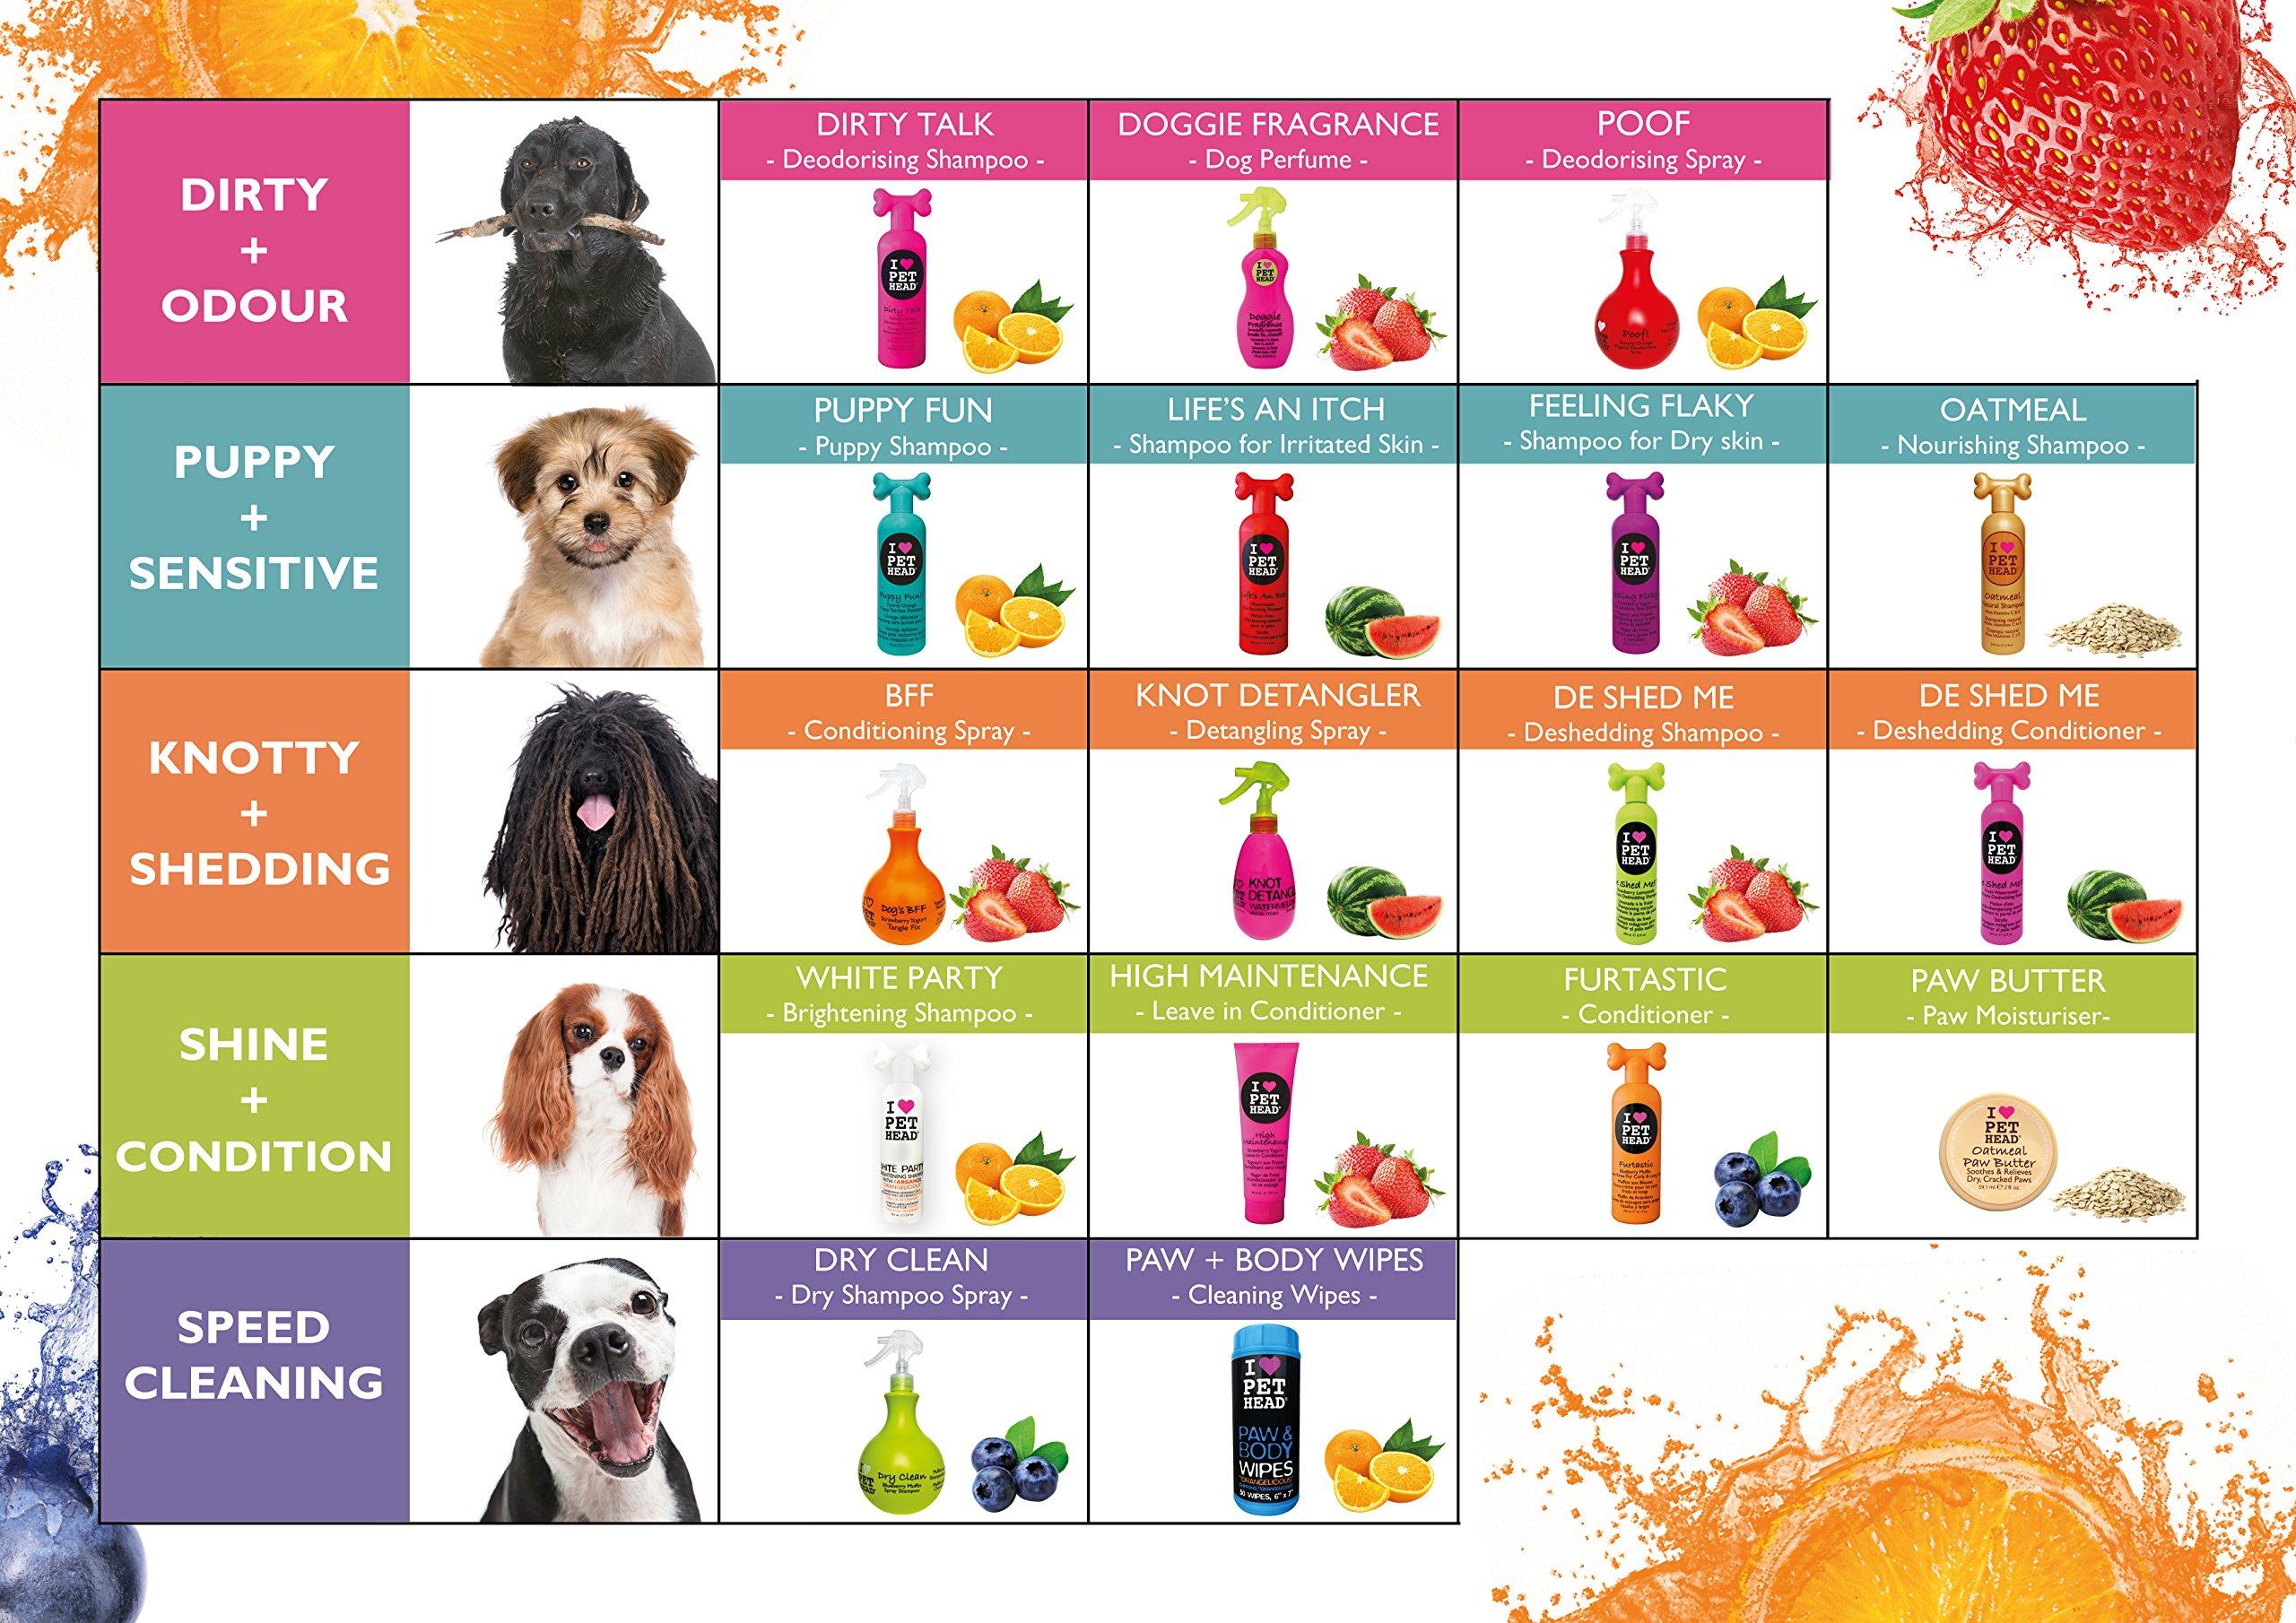 Pet Head Fur Ball Detangling Spray for Pets Strawberry Yogurt -- 15.2 fl oz by The Company of Animals (Image #8)